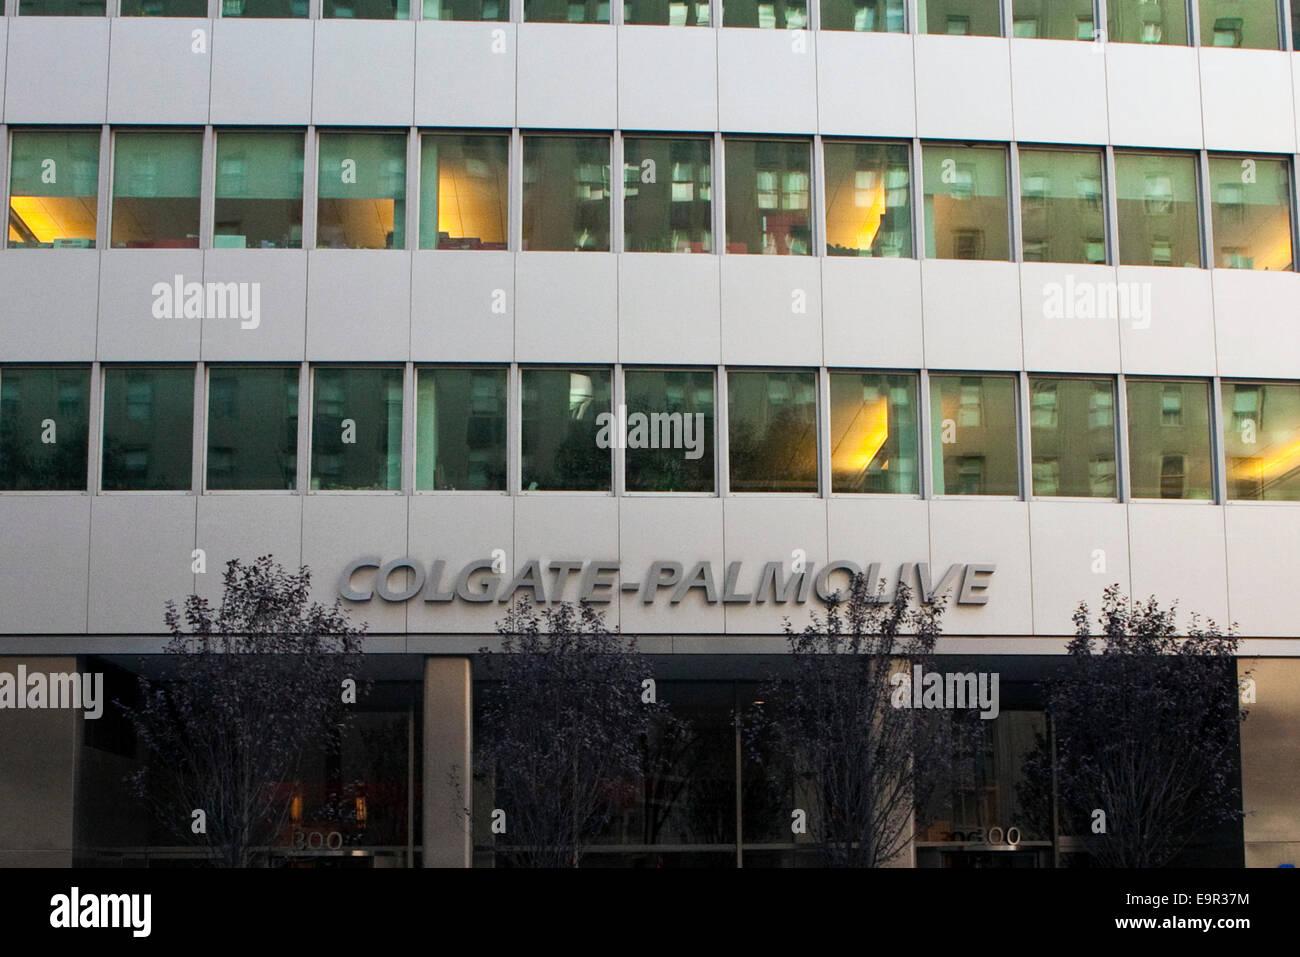 colgate company